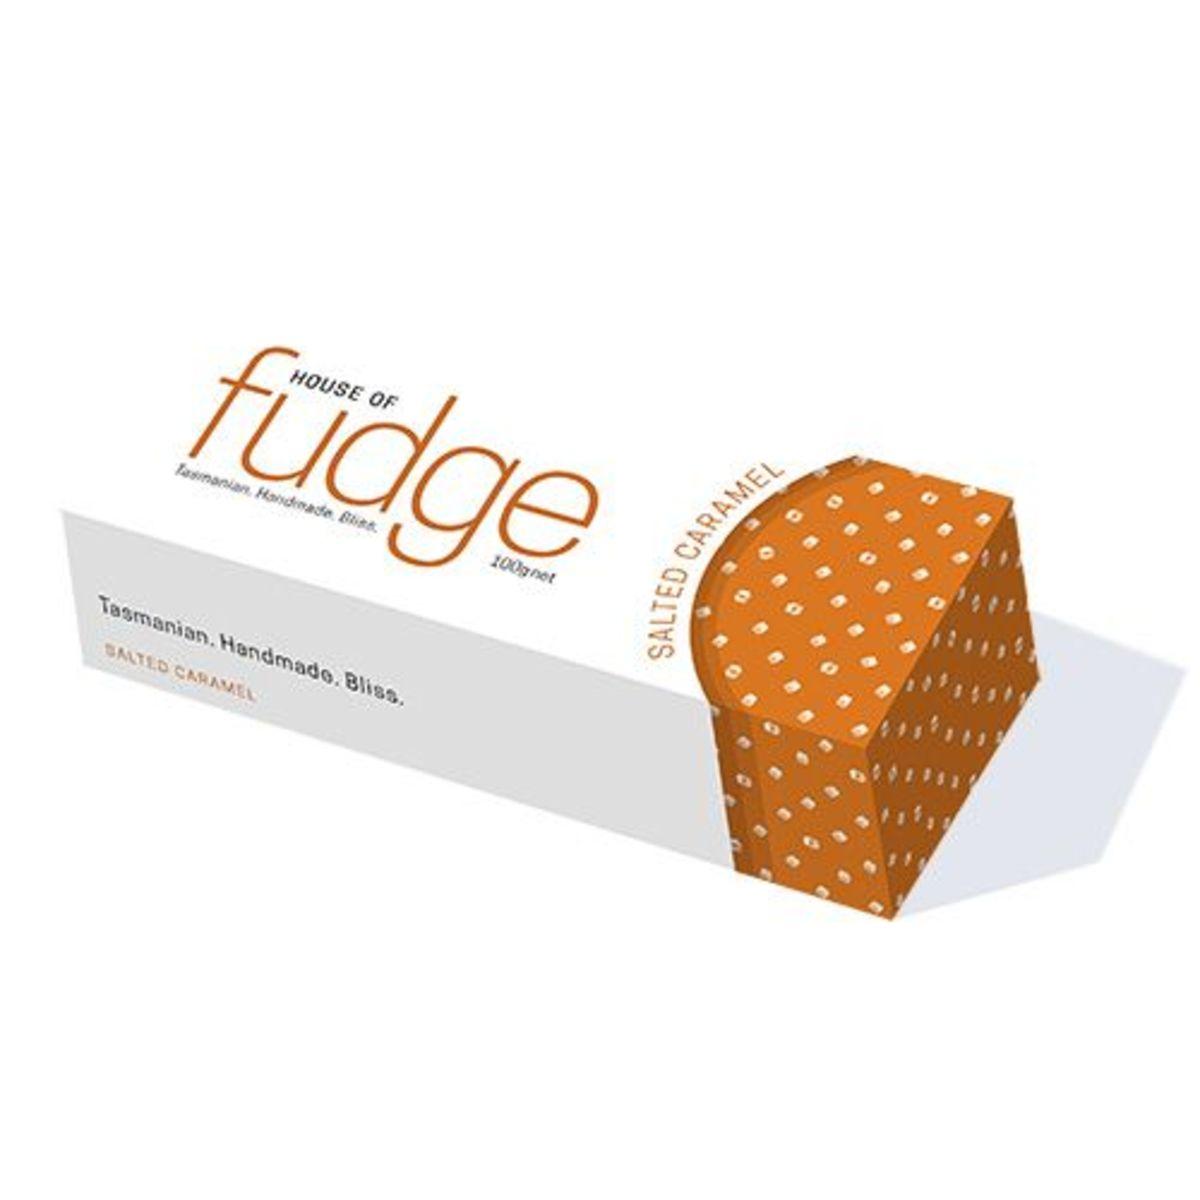 House of Fudge - Salted Caramel